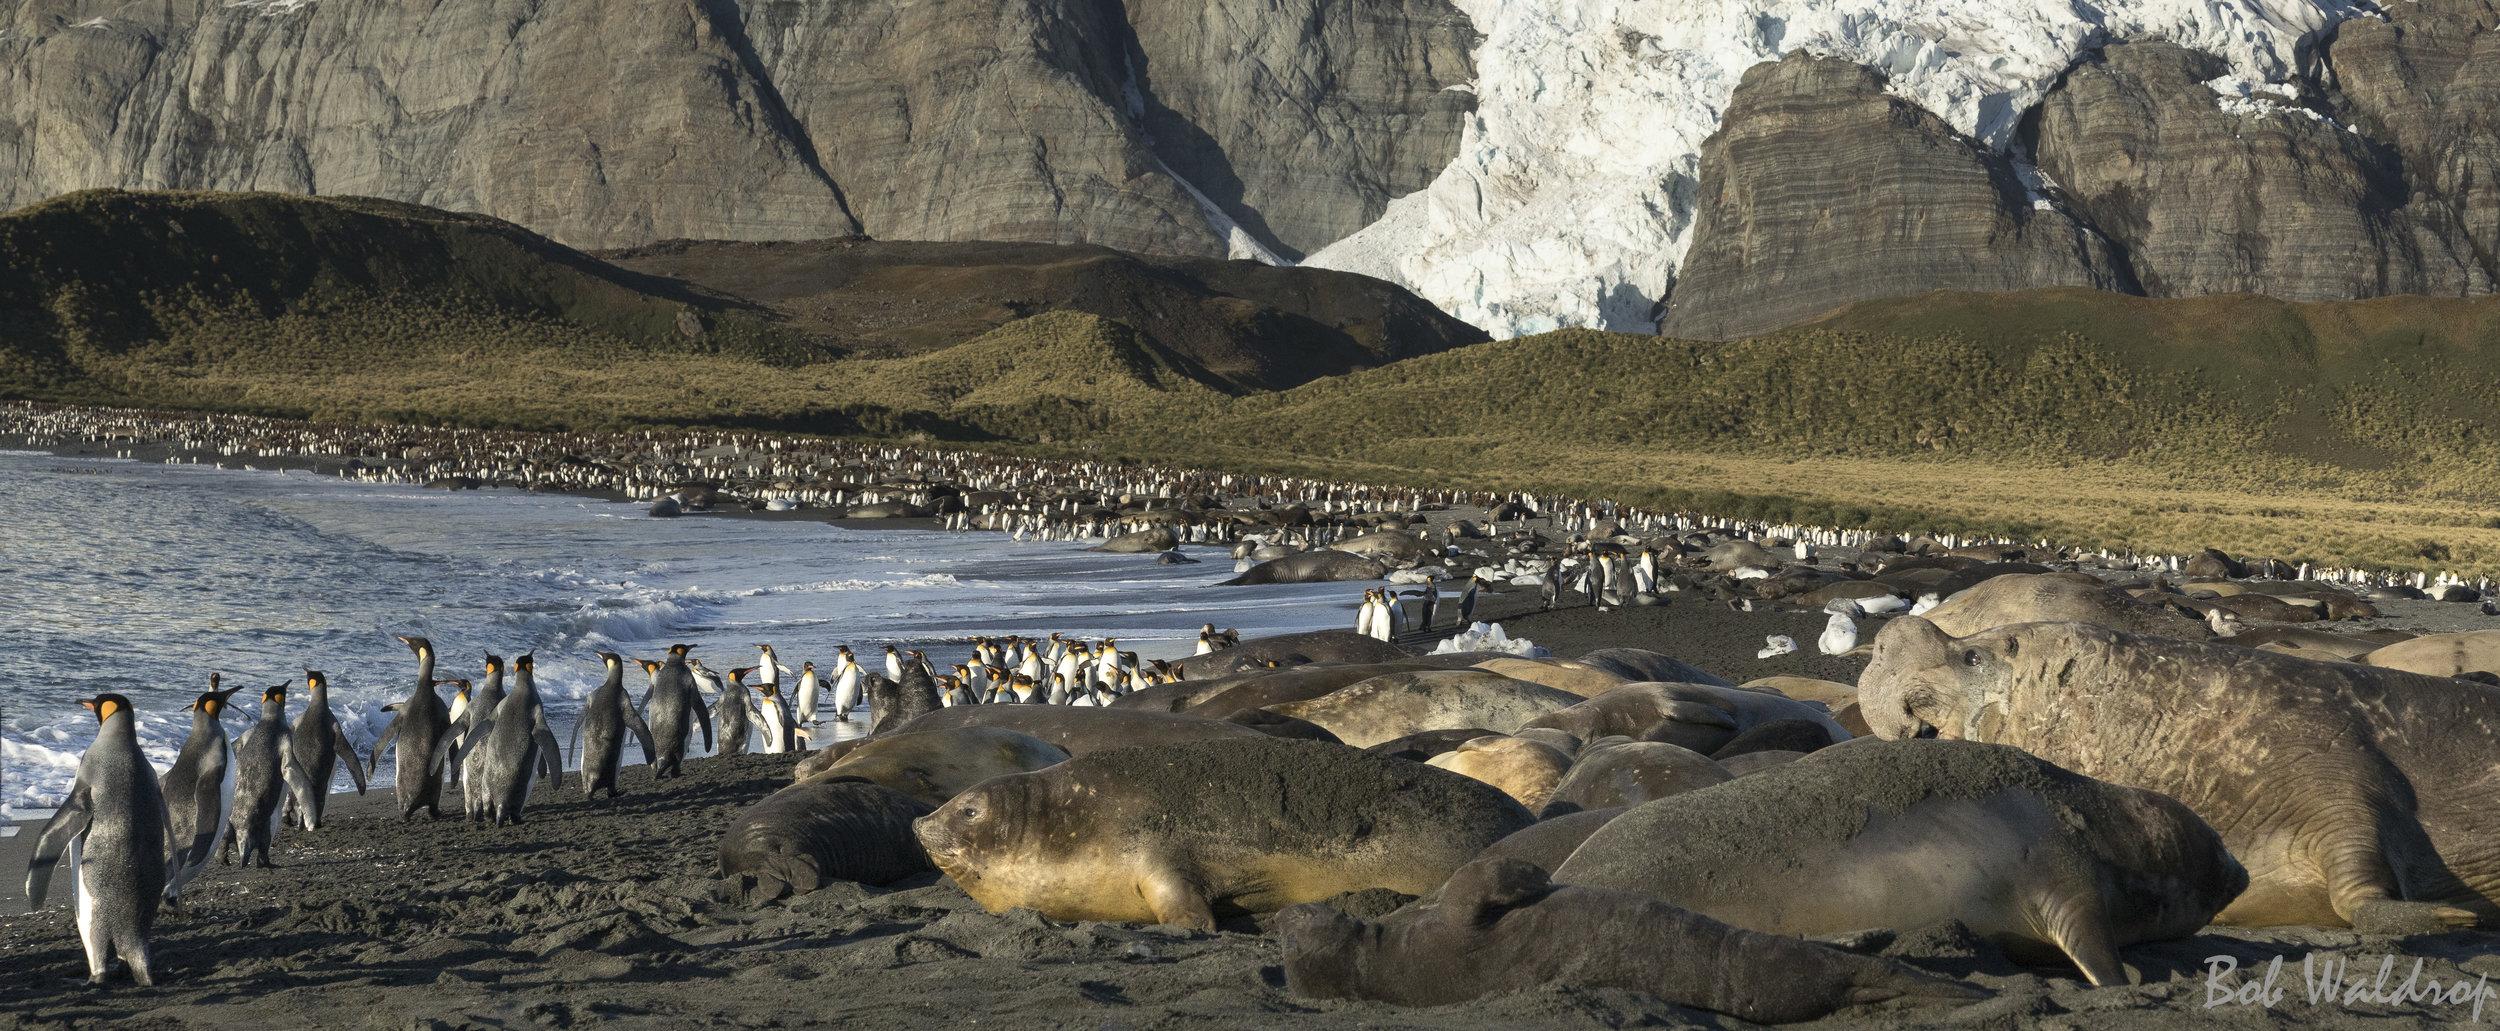 Antarctica-8043-Edit.JPG